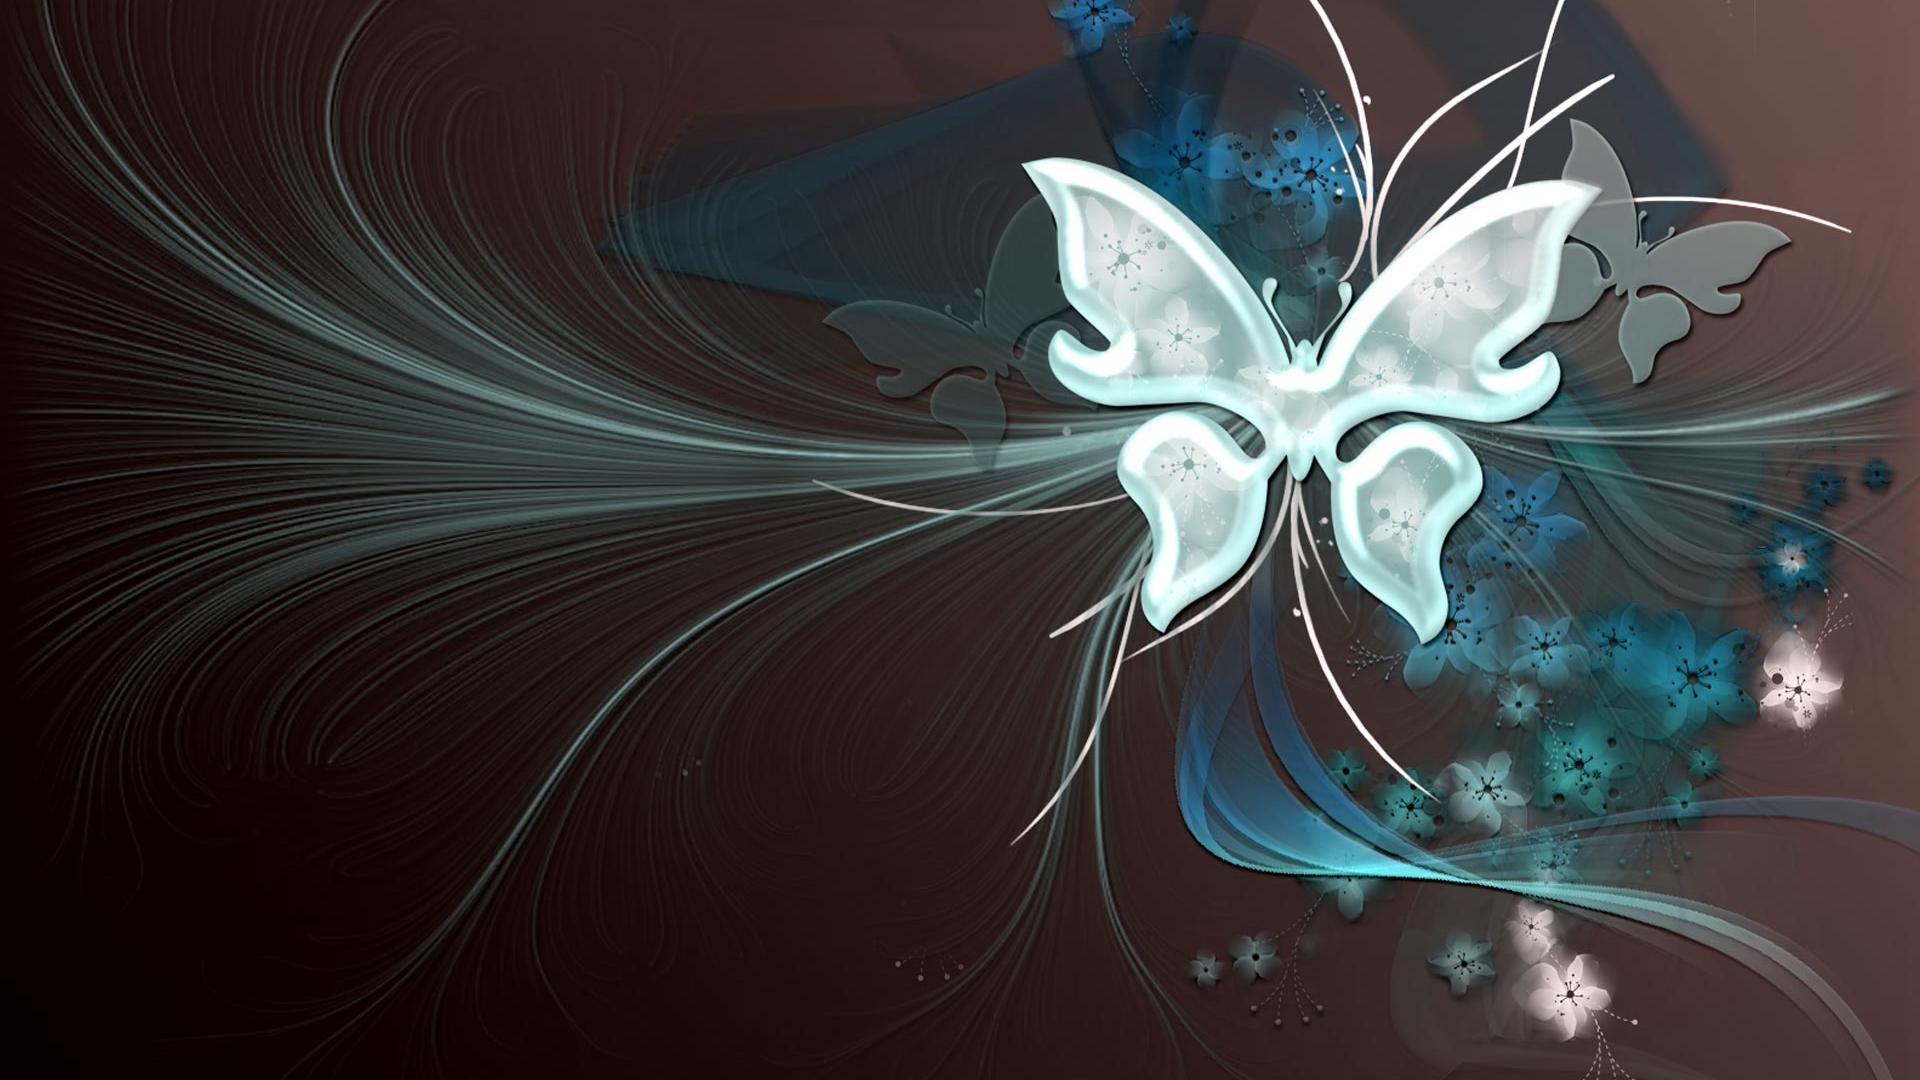 Butterfly Vector Art Background HD Wallpaper of Vector 1920x1080